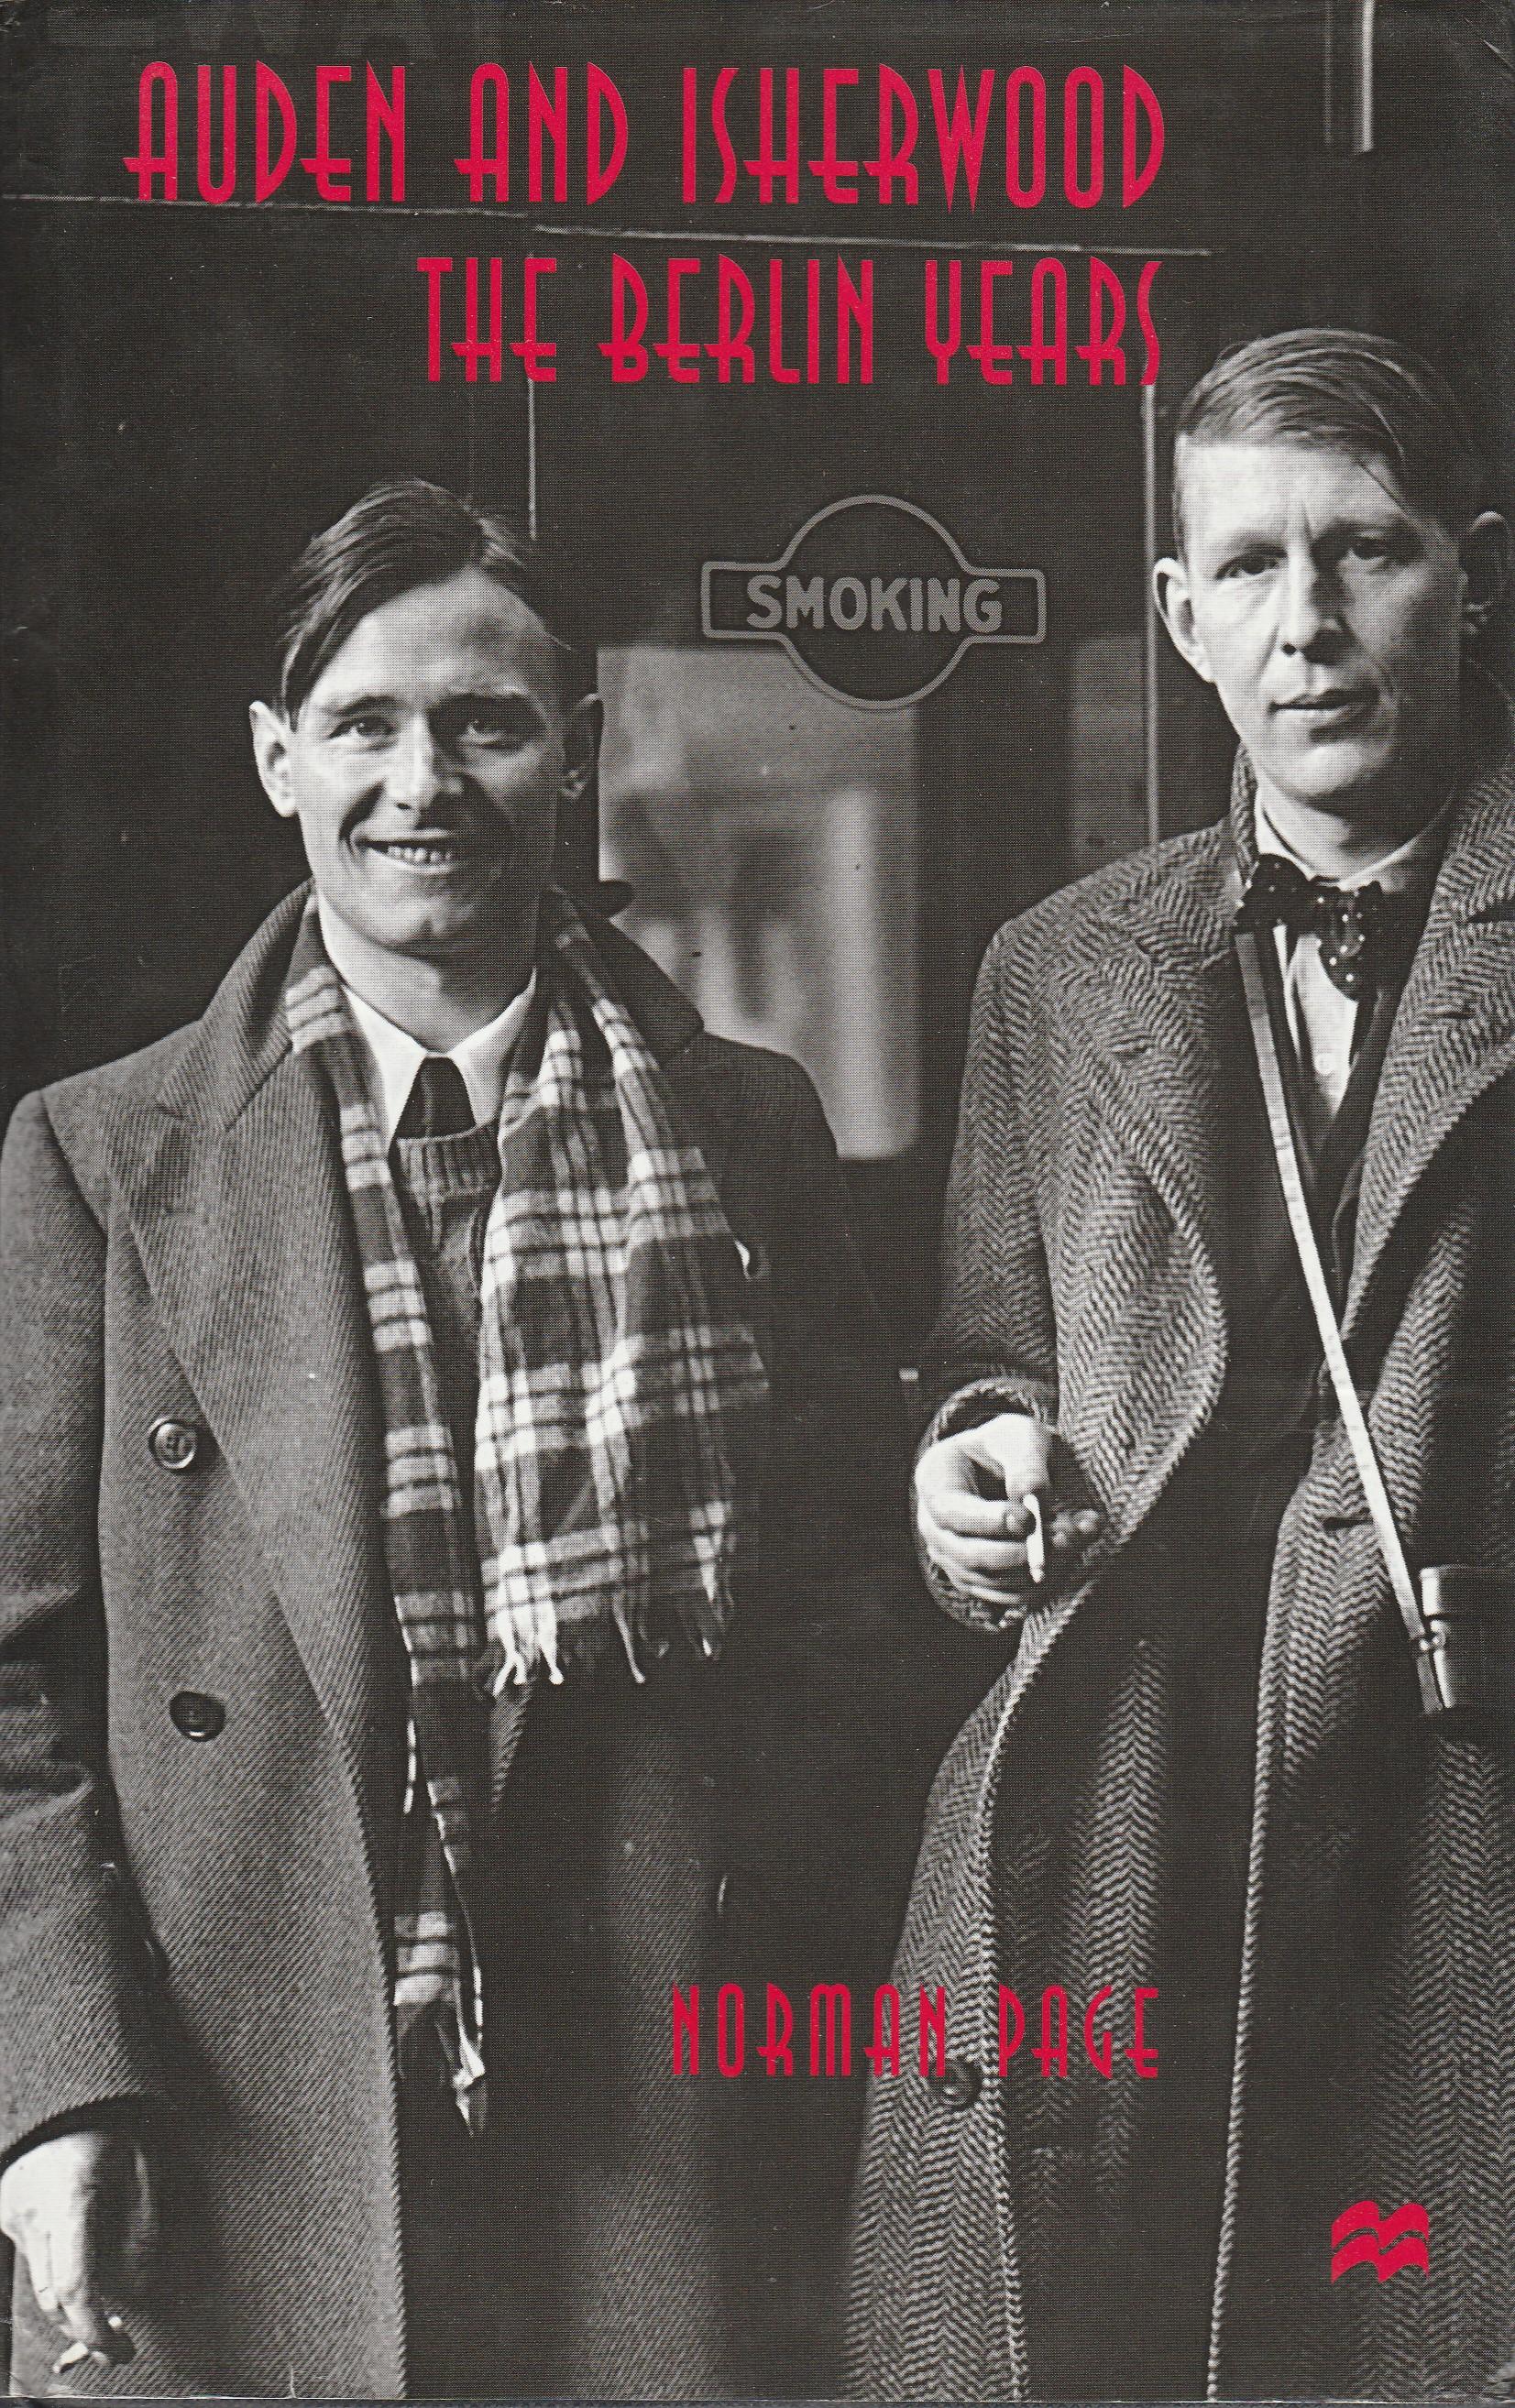 Auden and Isherwood,...